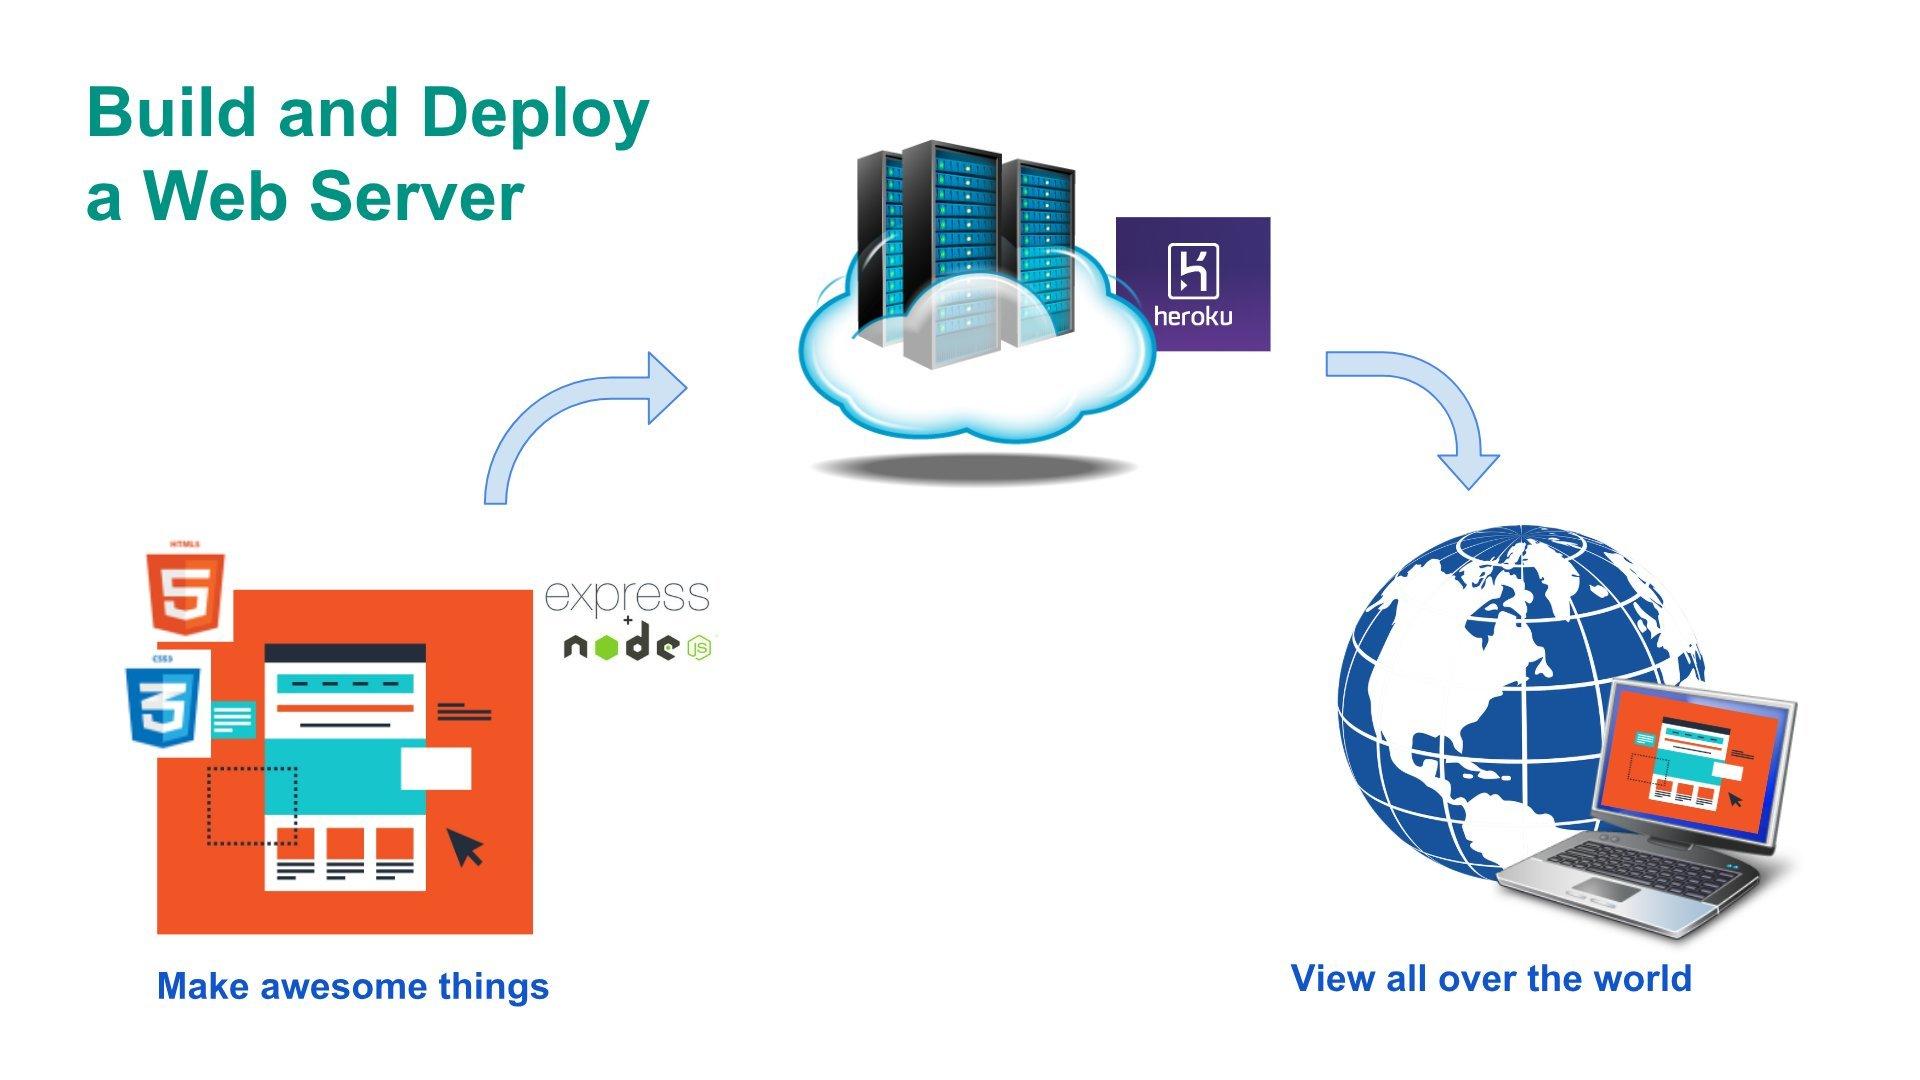 Build and Deploy a Web Server with Node.js and Heroku